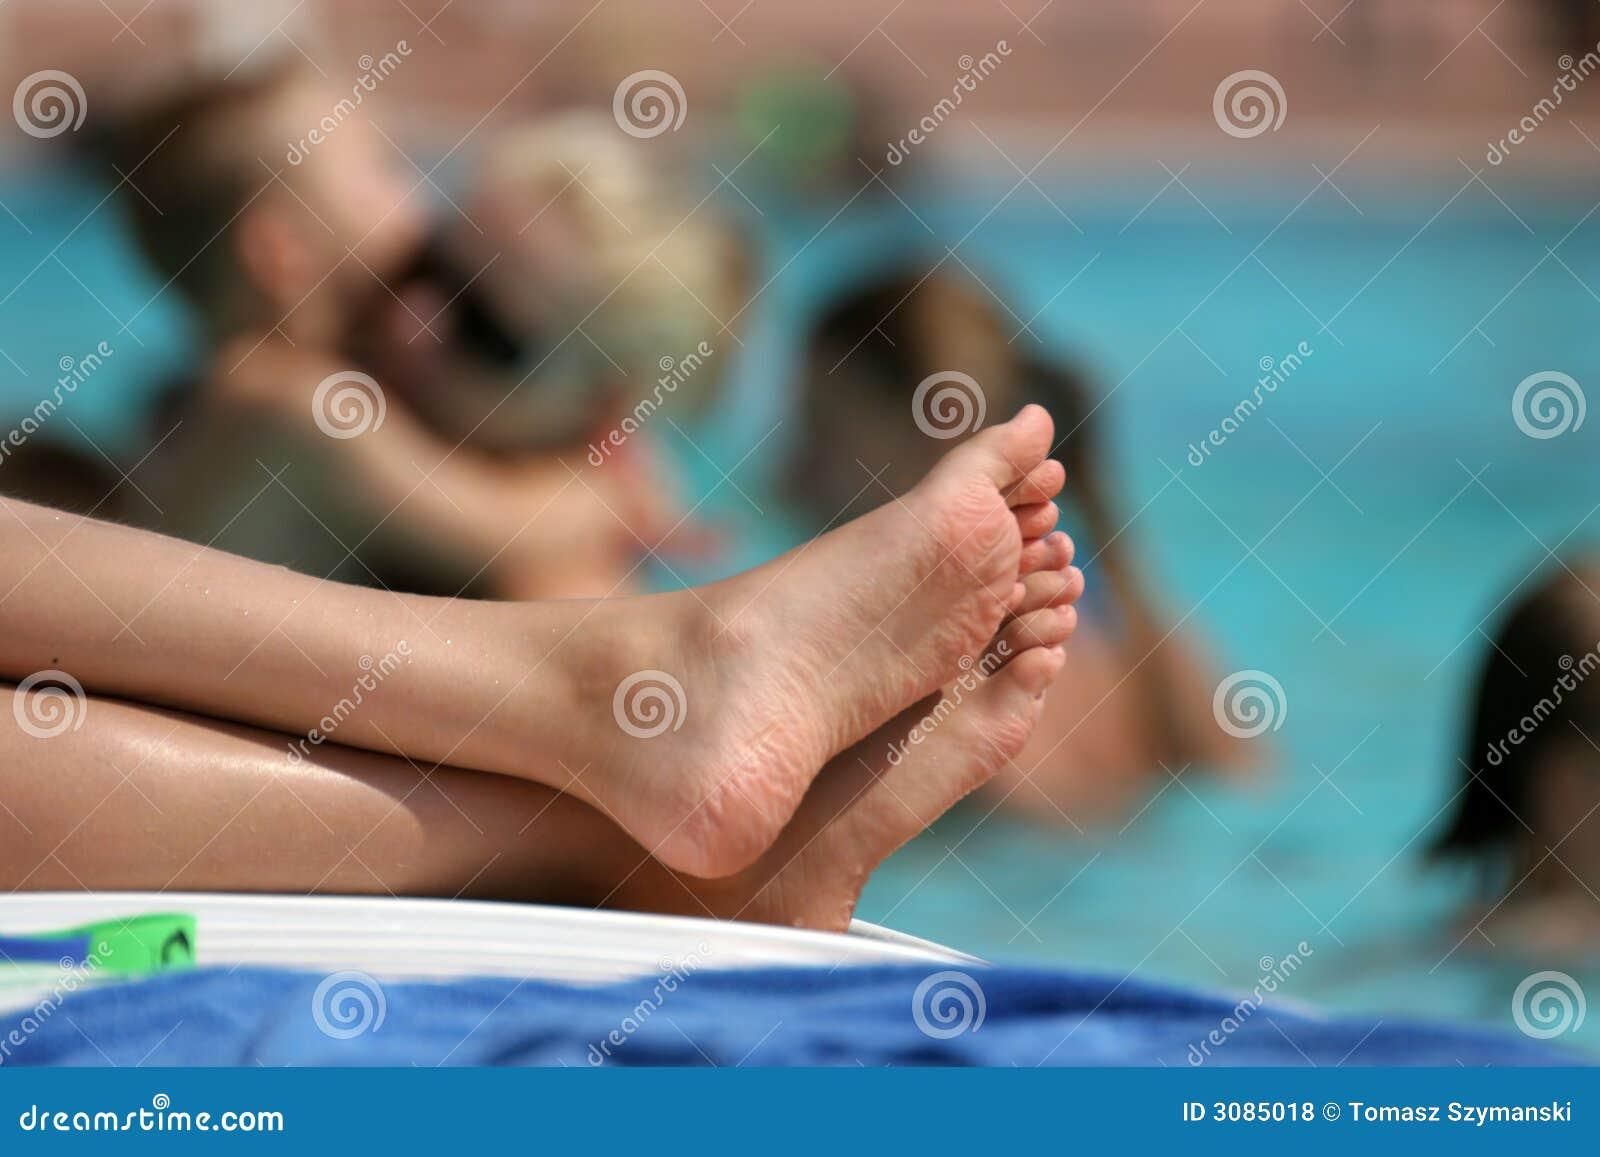 Swimming Pool Royalty Free Stock Photos Image 3085018